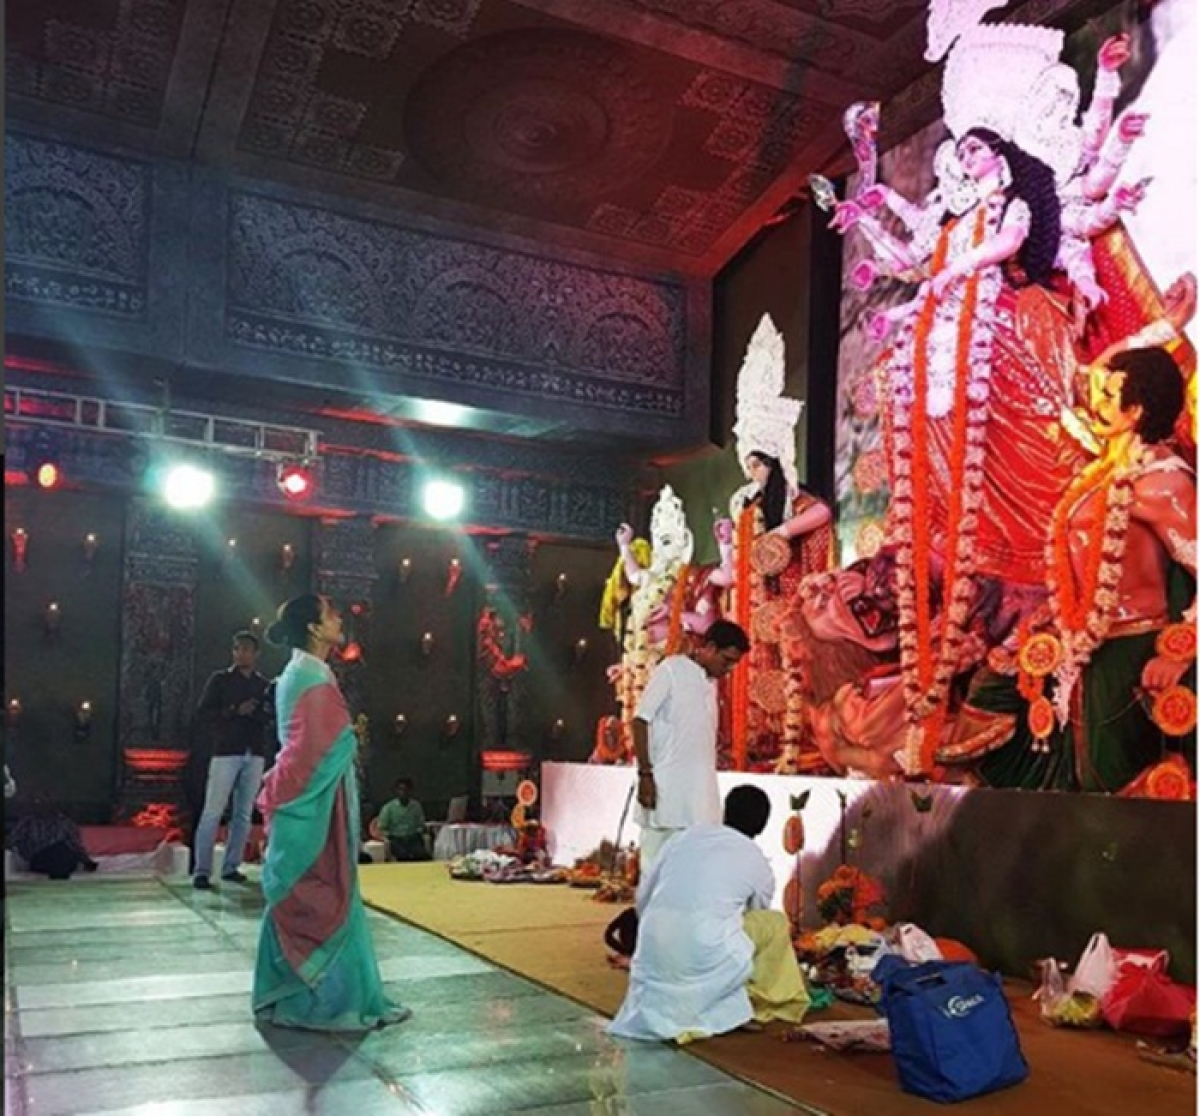 In Pics and video: Kajol, Sonu Nigam, Sumona, Kavita Kaushik and others offer prayers during Durga Puja in Mumbai